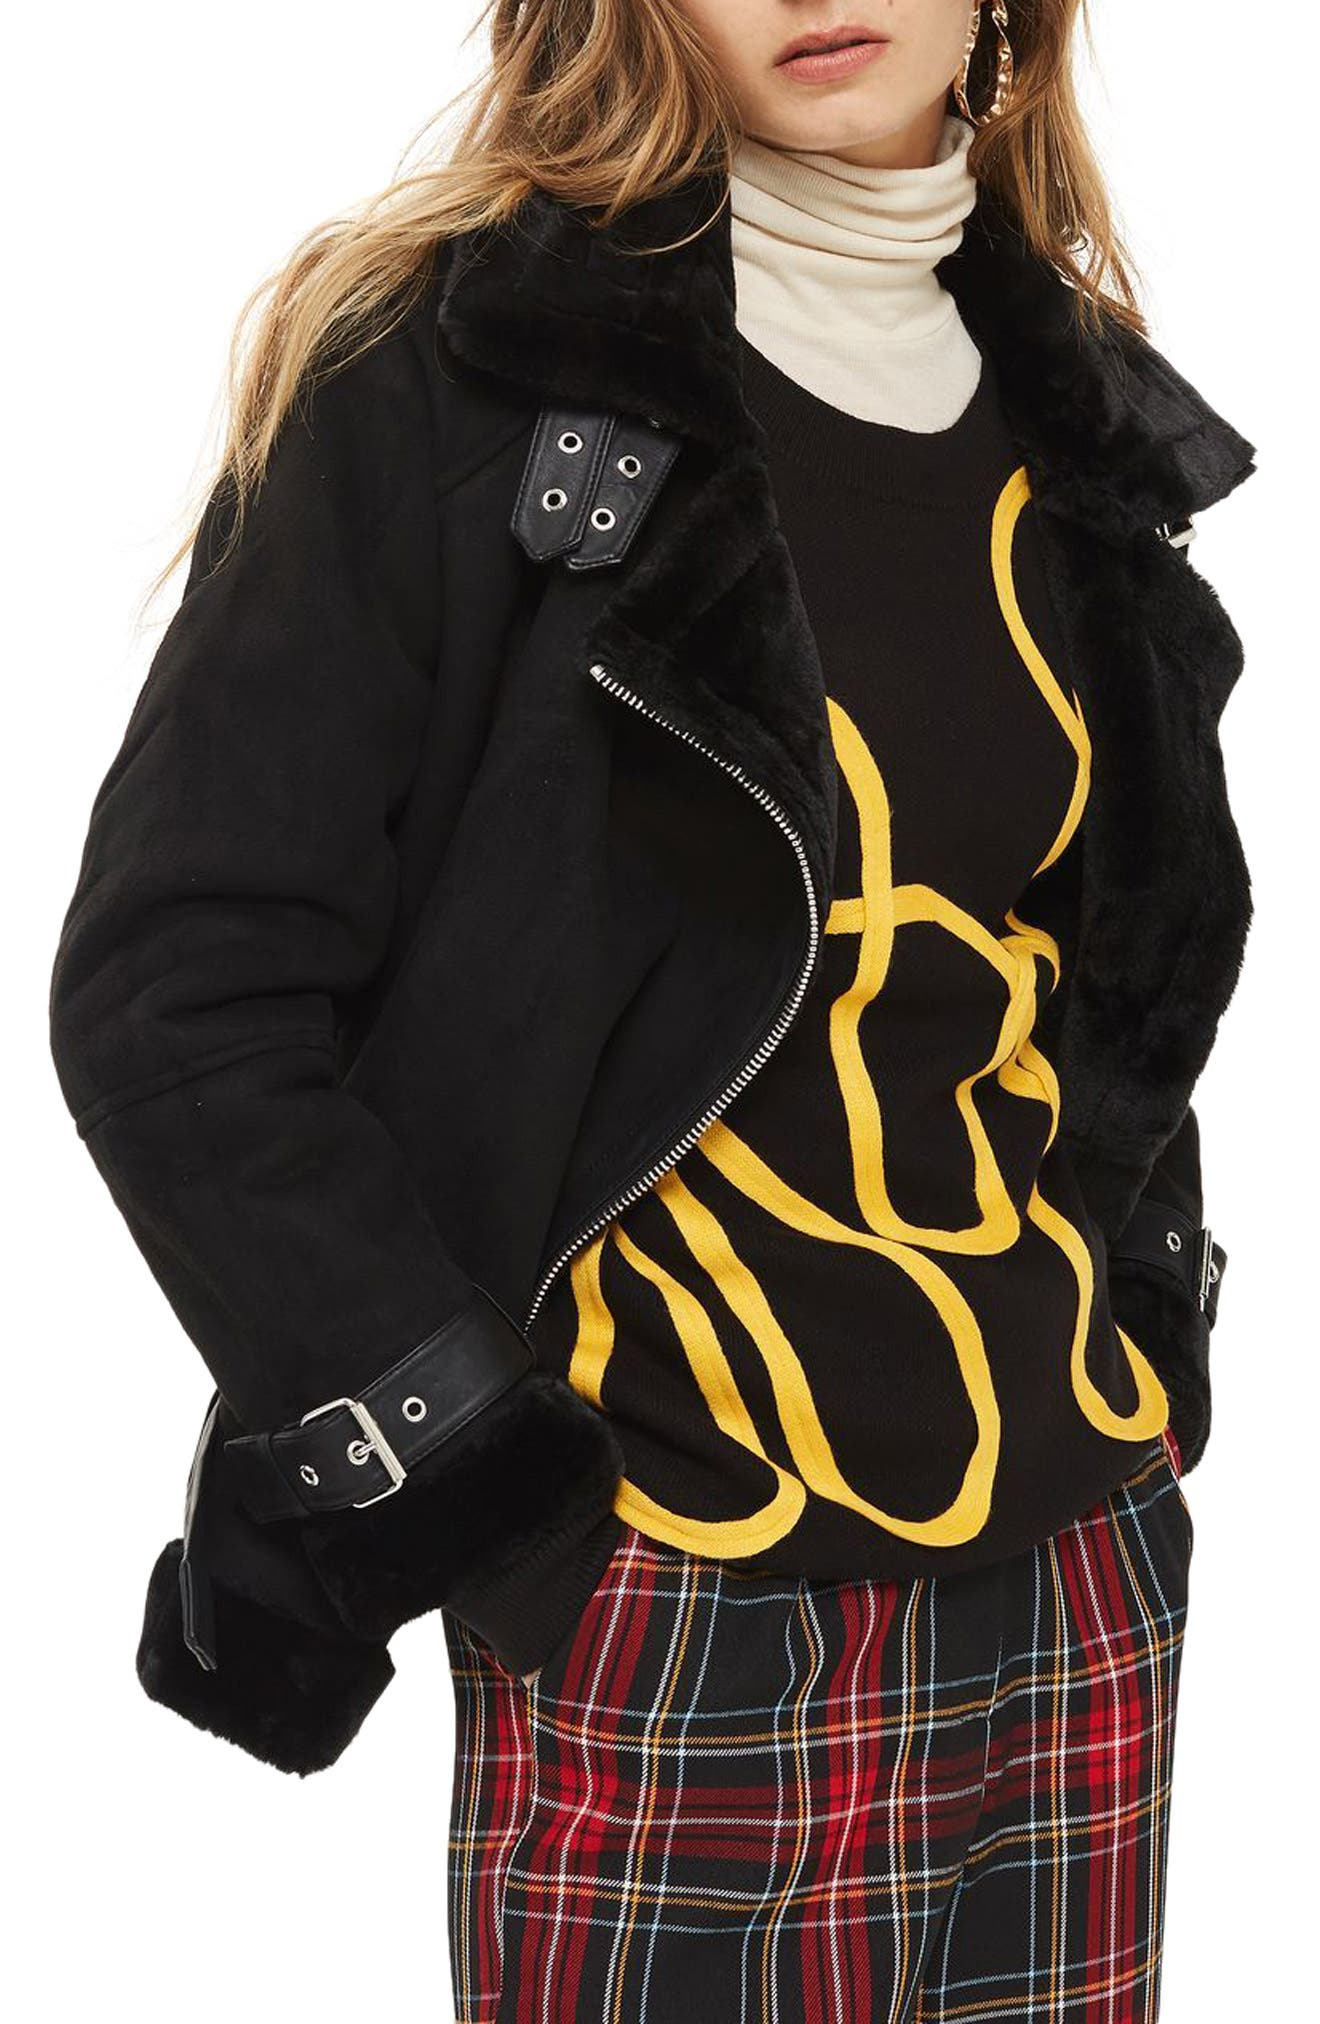 Alternate Image 1 Selected - Topshop Faux Shearling Biker Jacket (Petite)